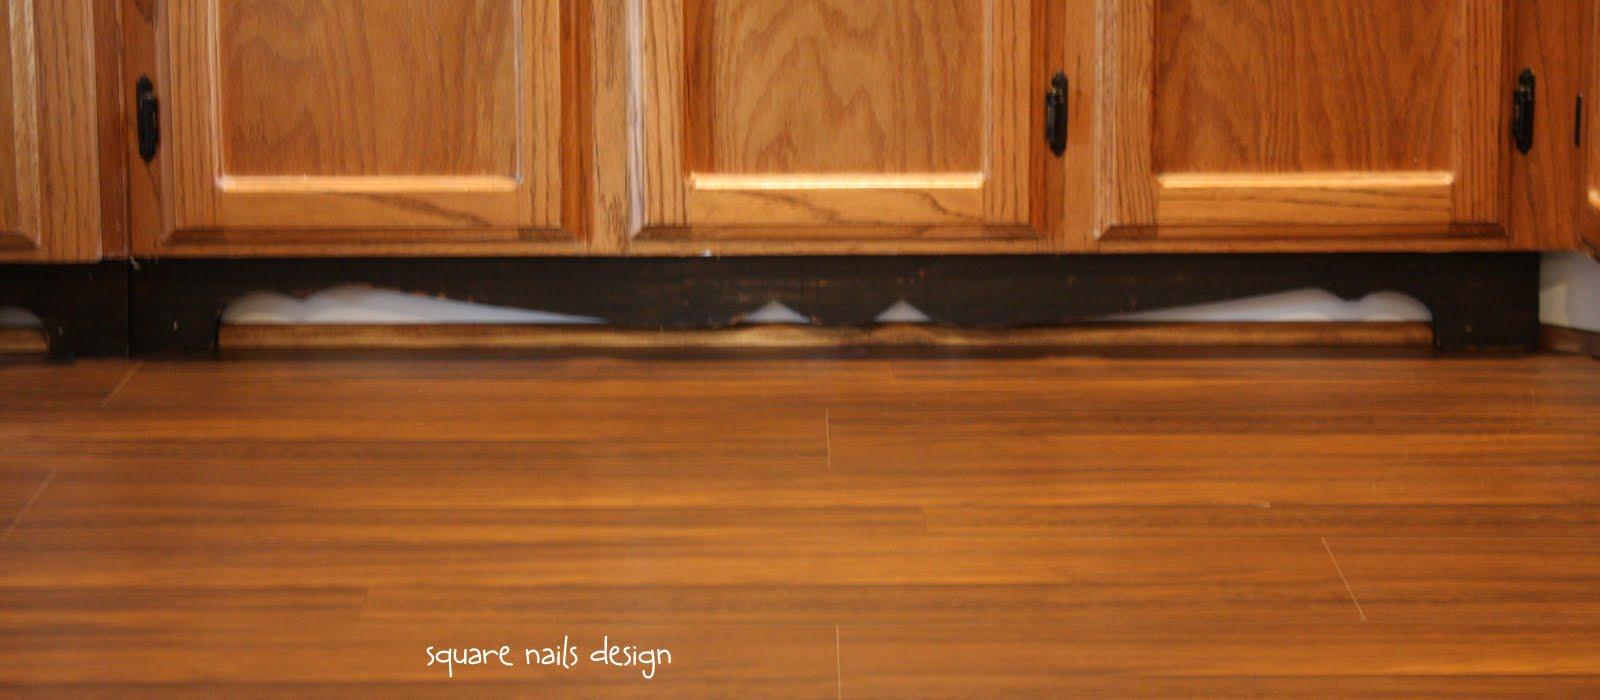 28 Kitchen Cabinet Kick Plate Add This Diy Detail